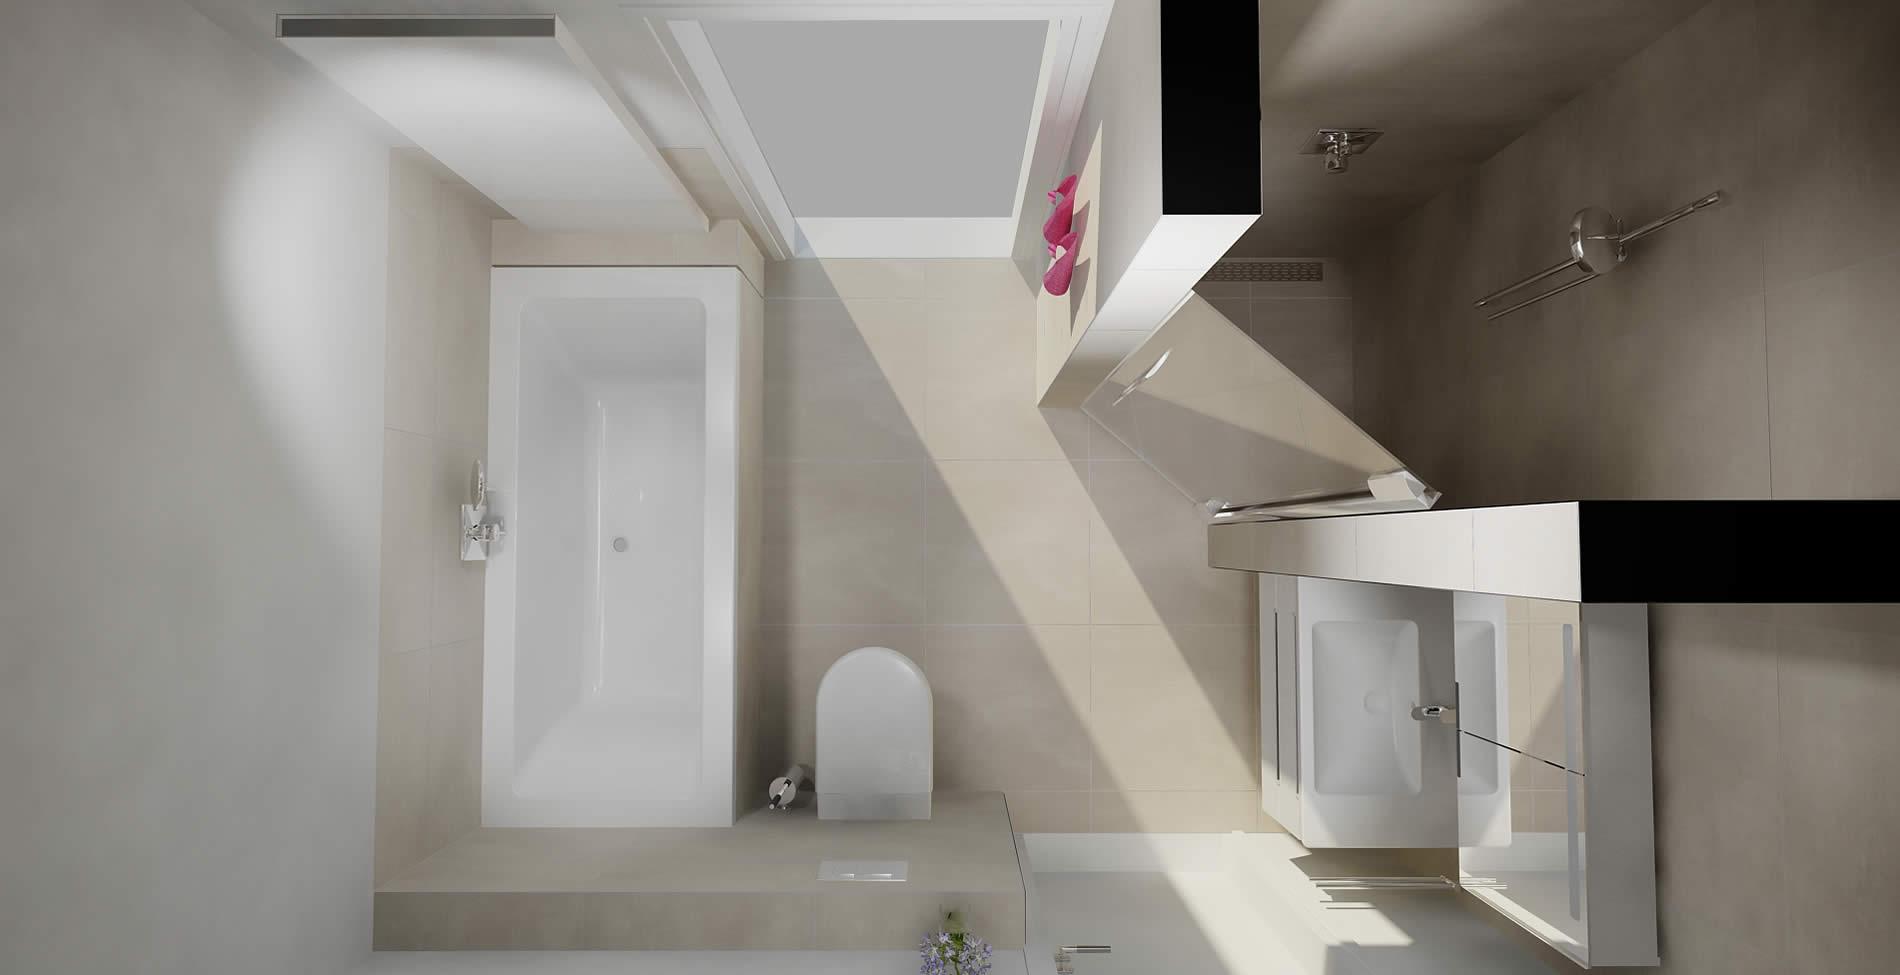 Slide-Badkamer-ontwerpen